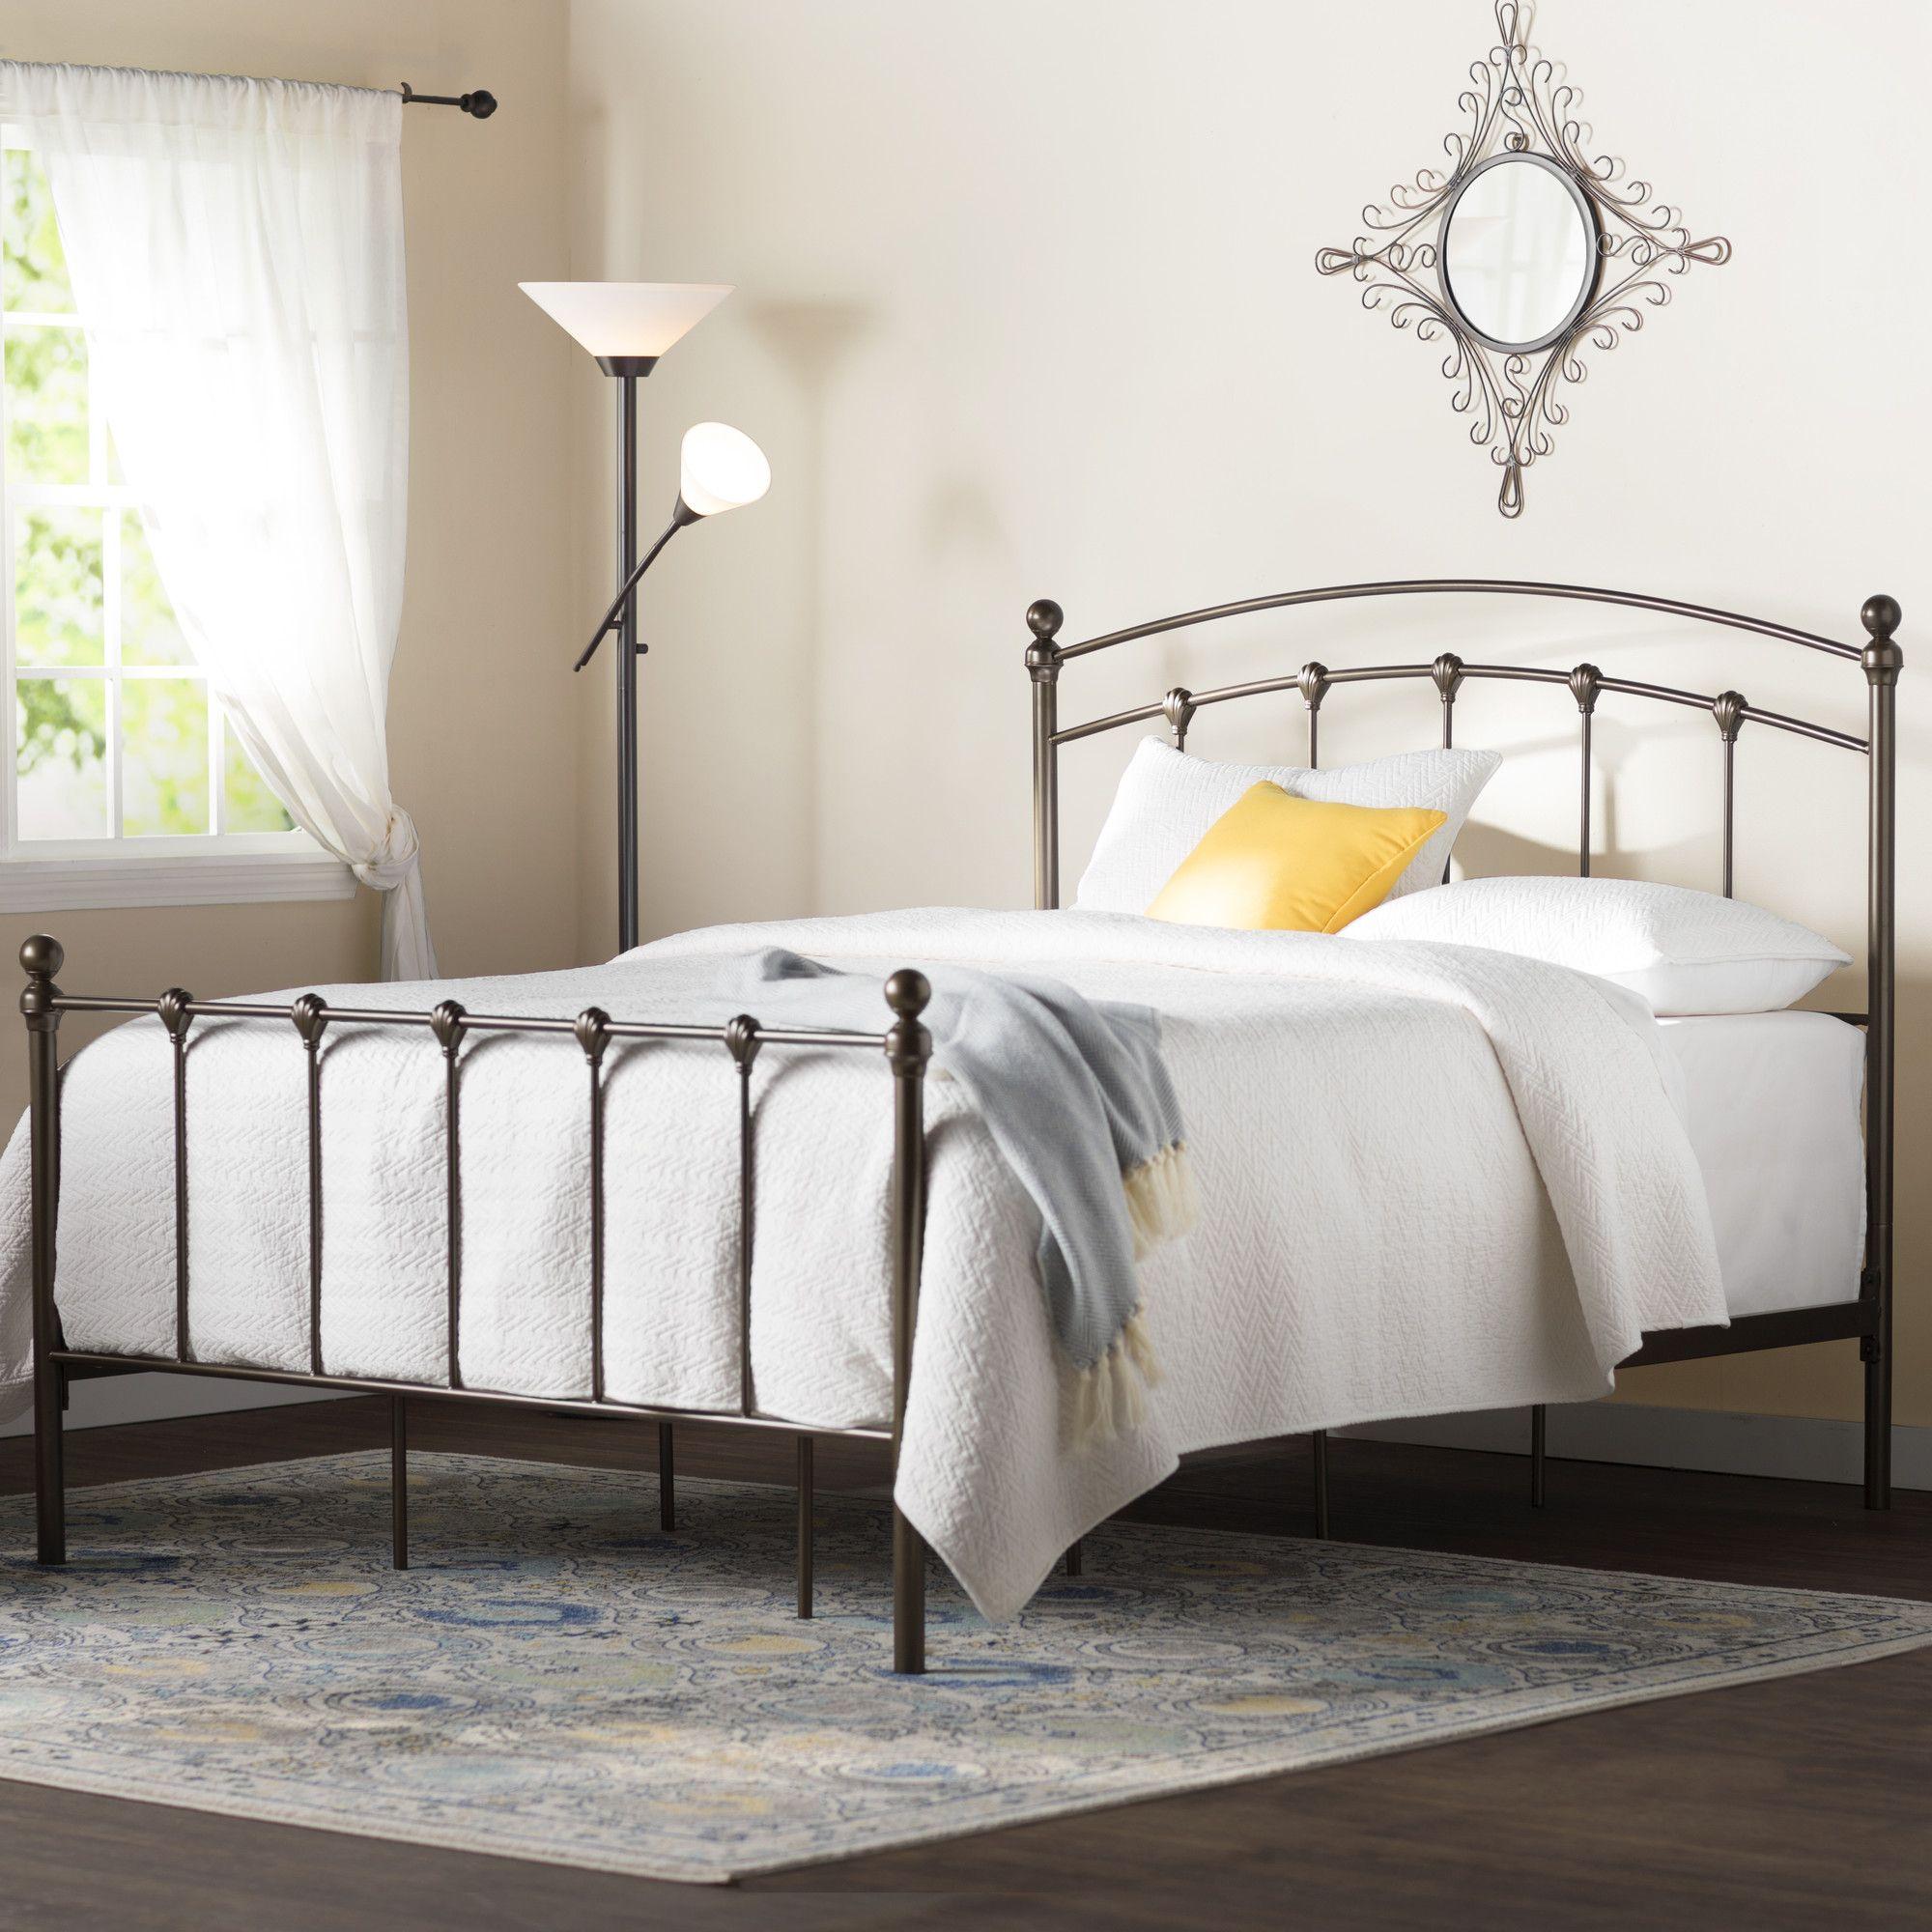 Bowman Metal Platform Bed Bed, Bed sizes, Panel bed